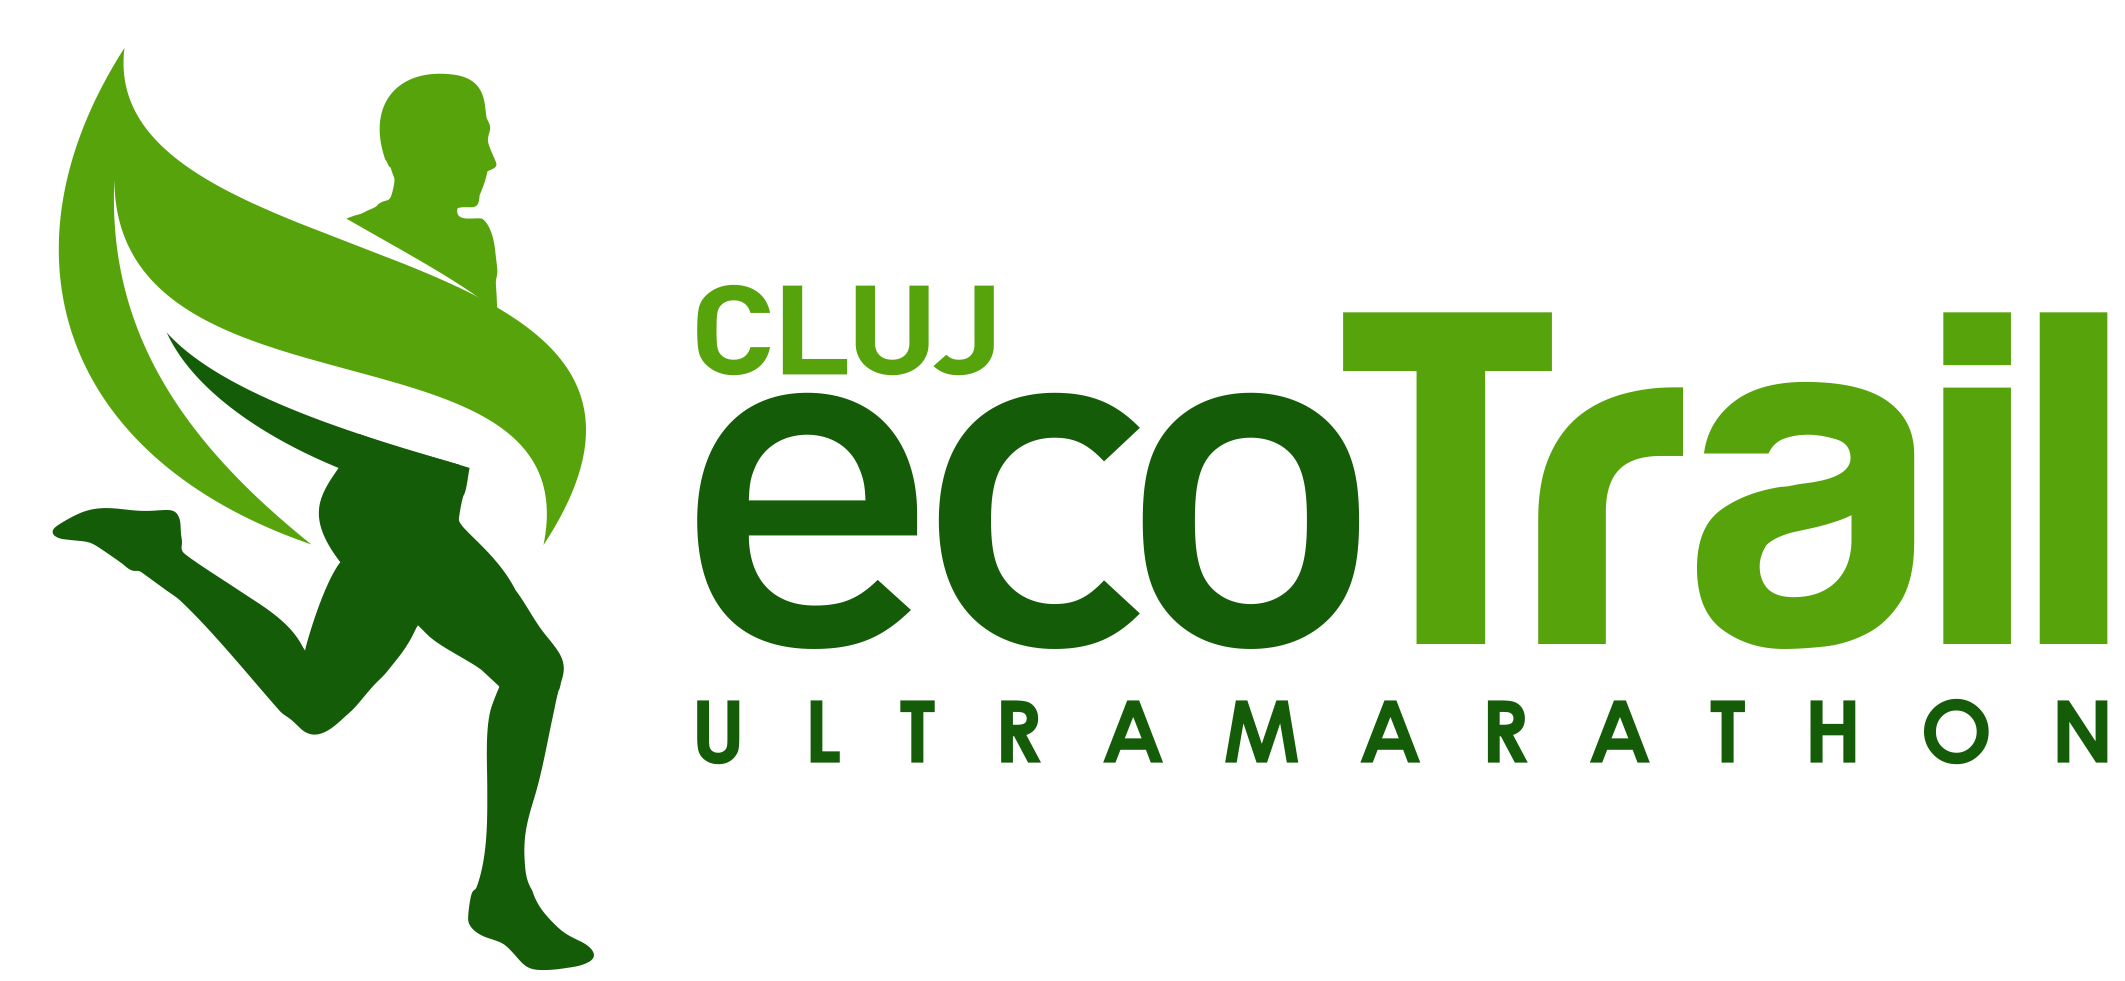 Cluj EcoTrail Ultramarathon